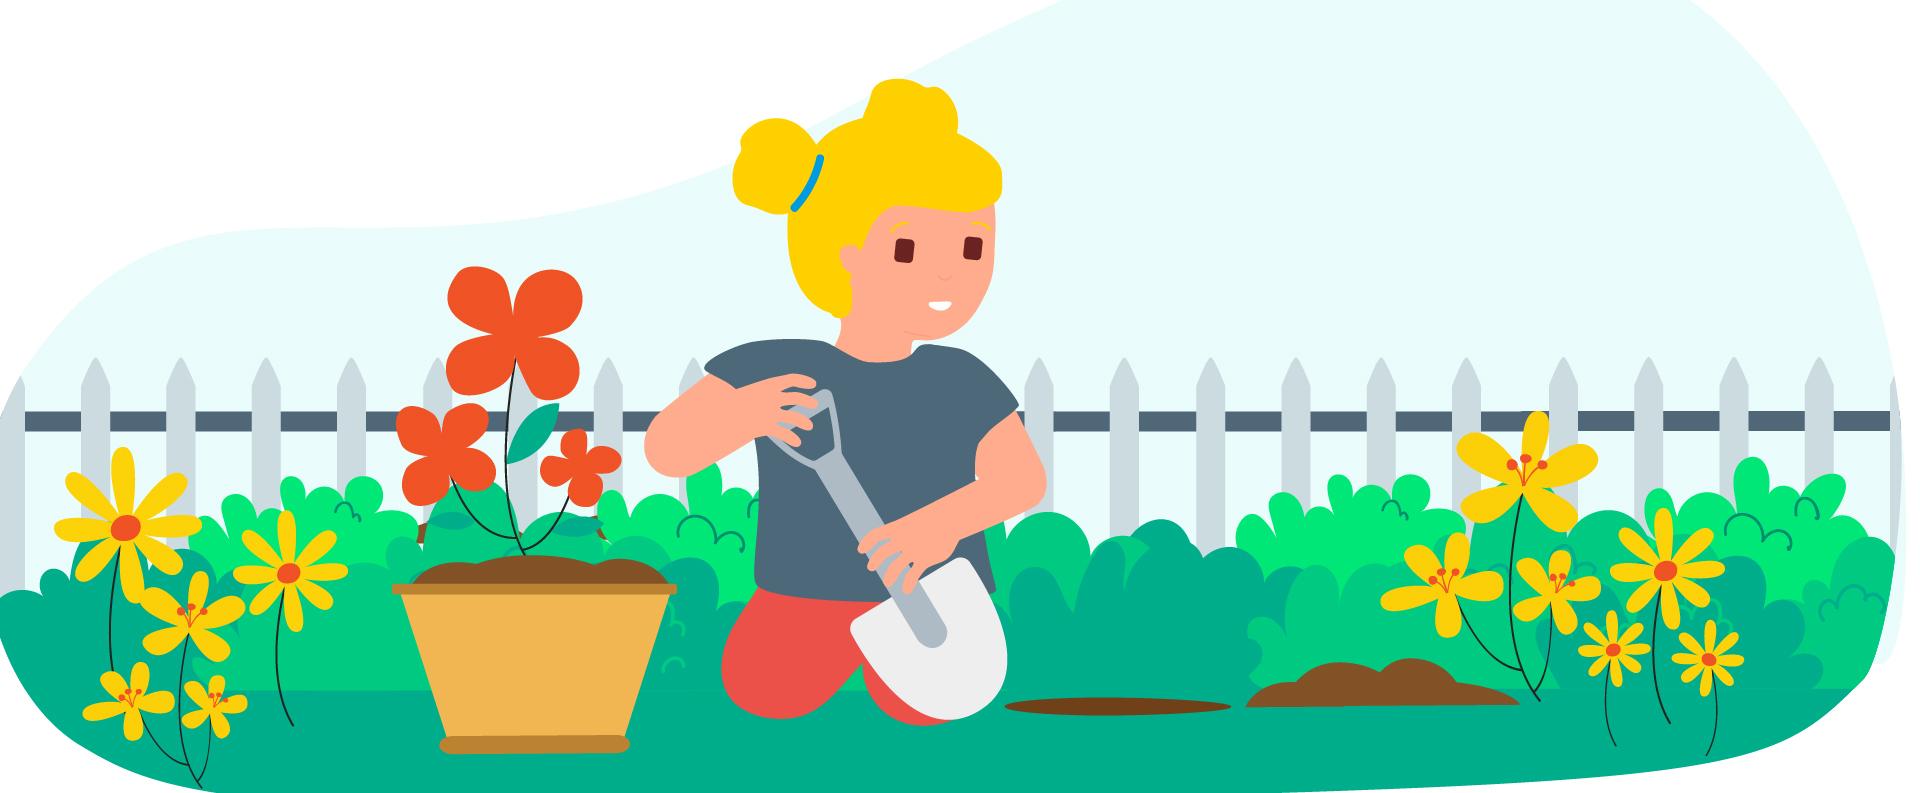 10 green ideas to explore gardening with children